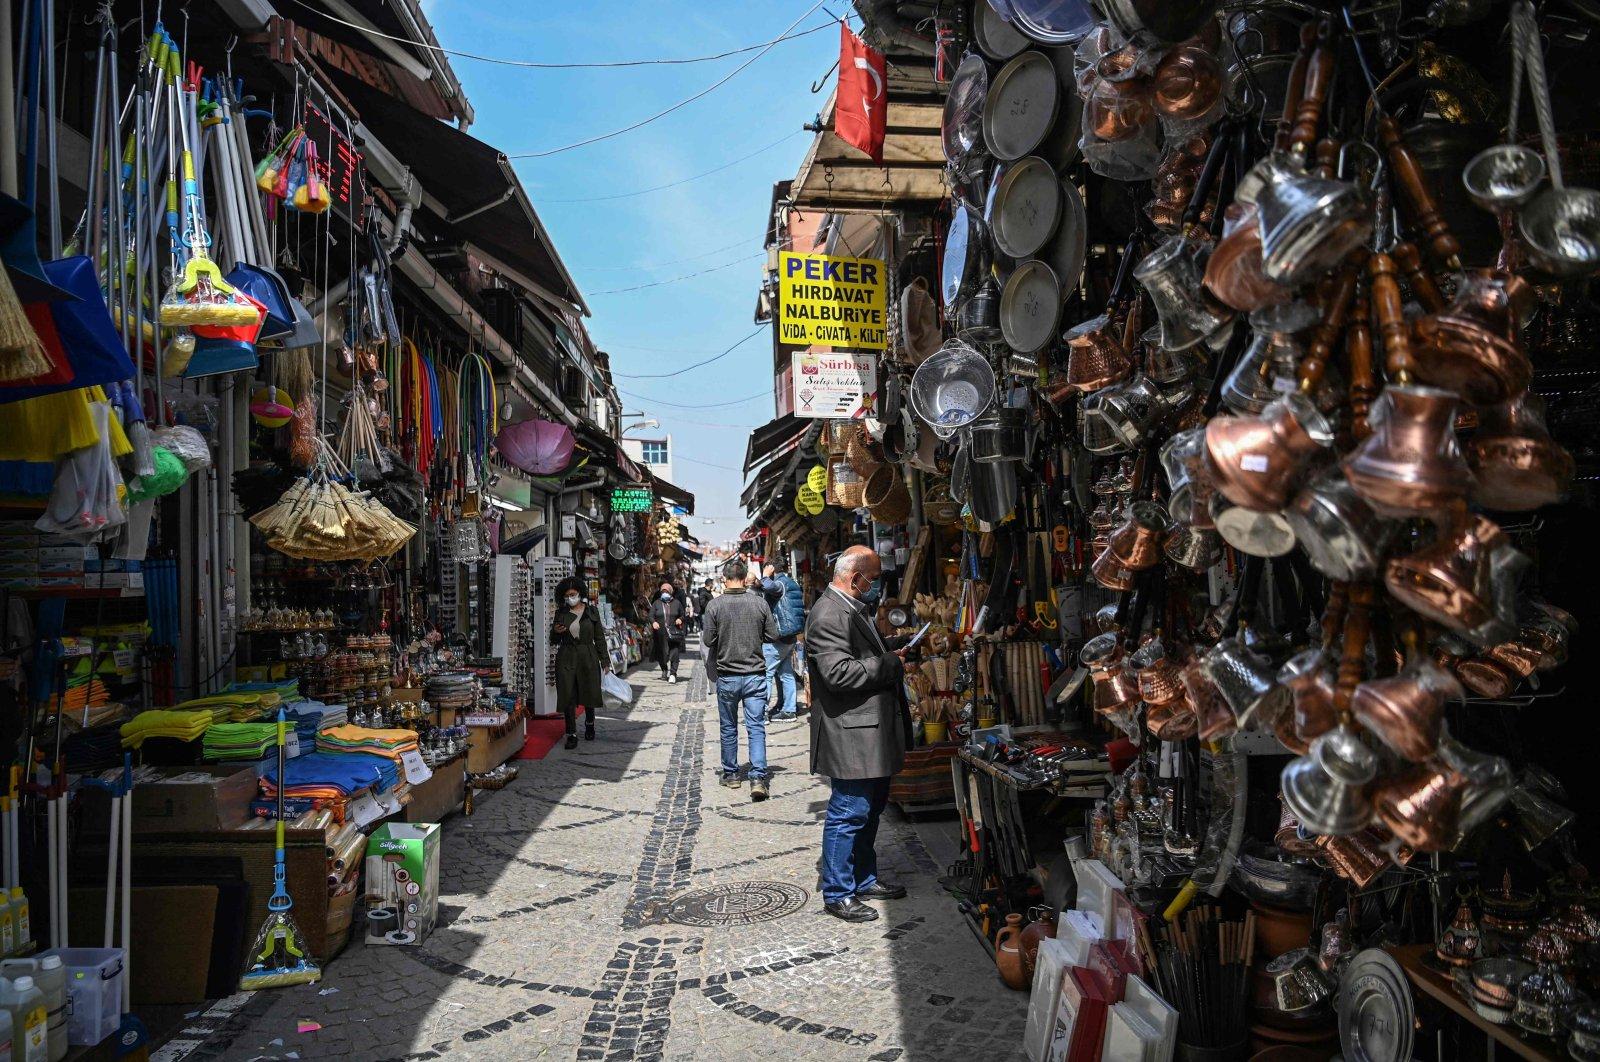 People shop near the Spice Bazaar in the Eminönü neighborhood in Istanbul, Turkey, April 27, 2021. (AFP Photo)